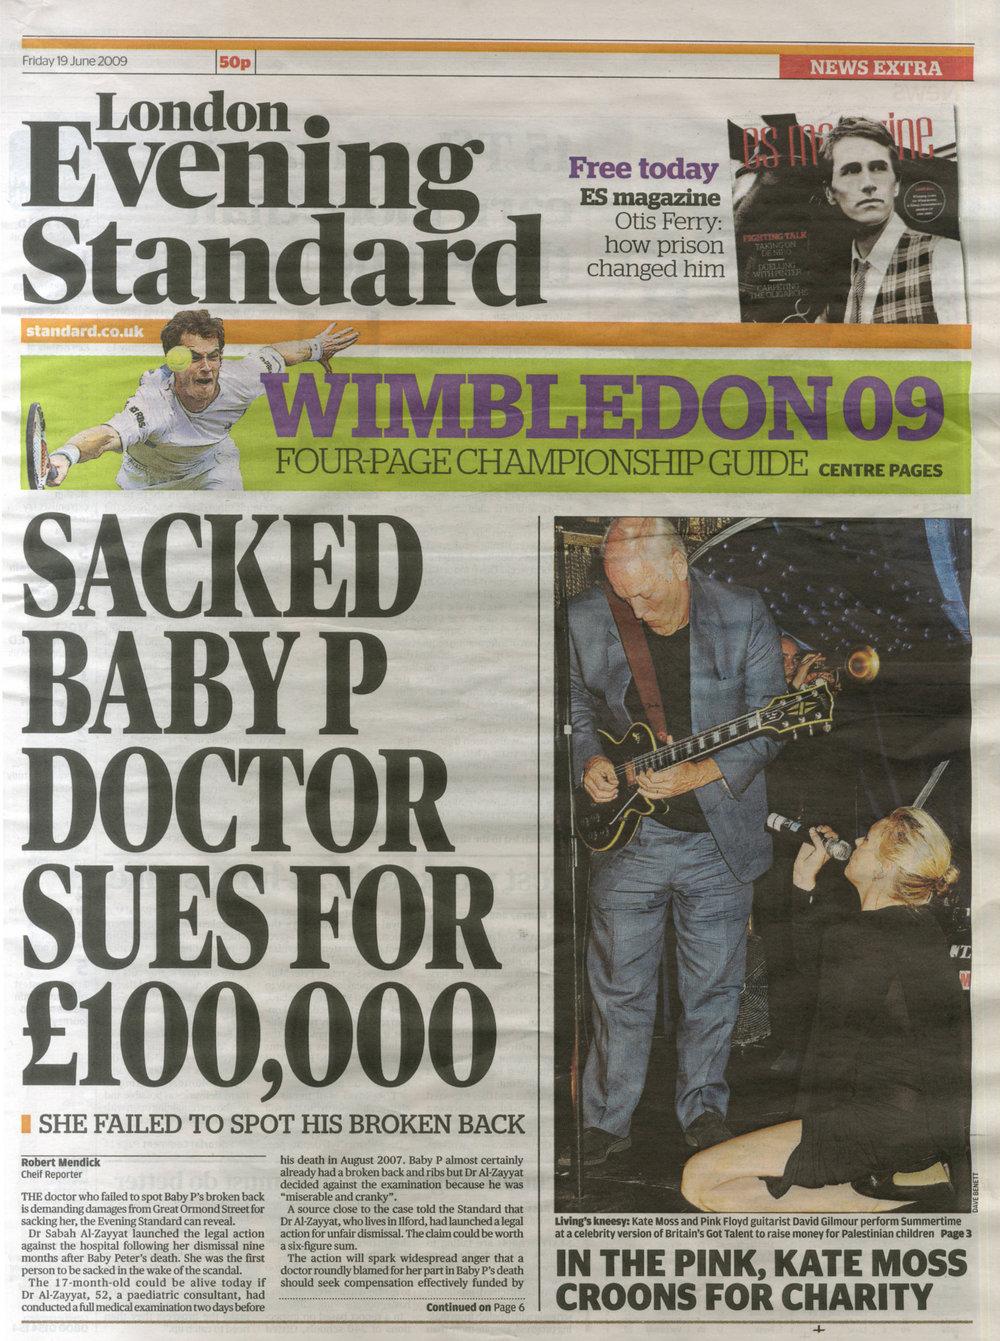 Evening Standard 090619 Front Cover.jpg